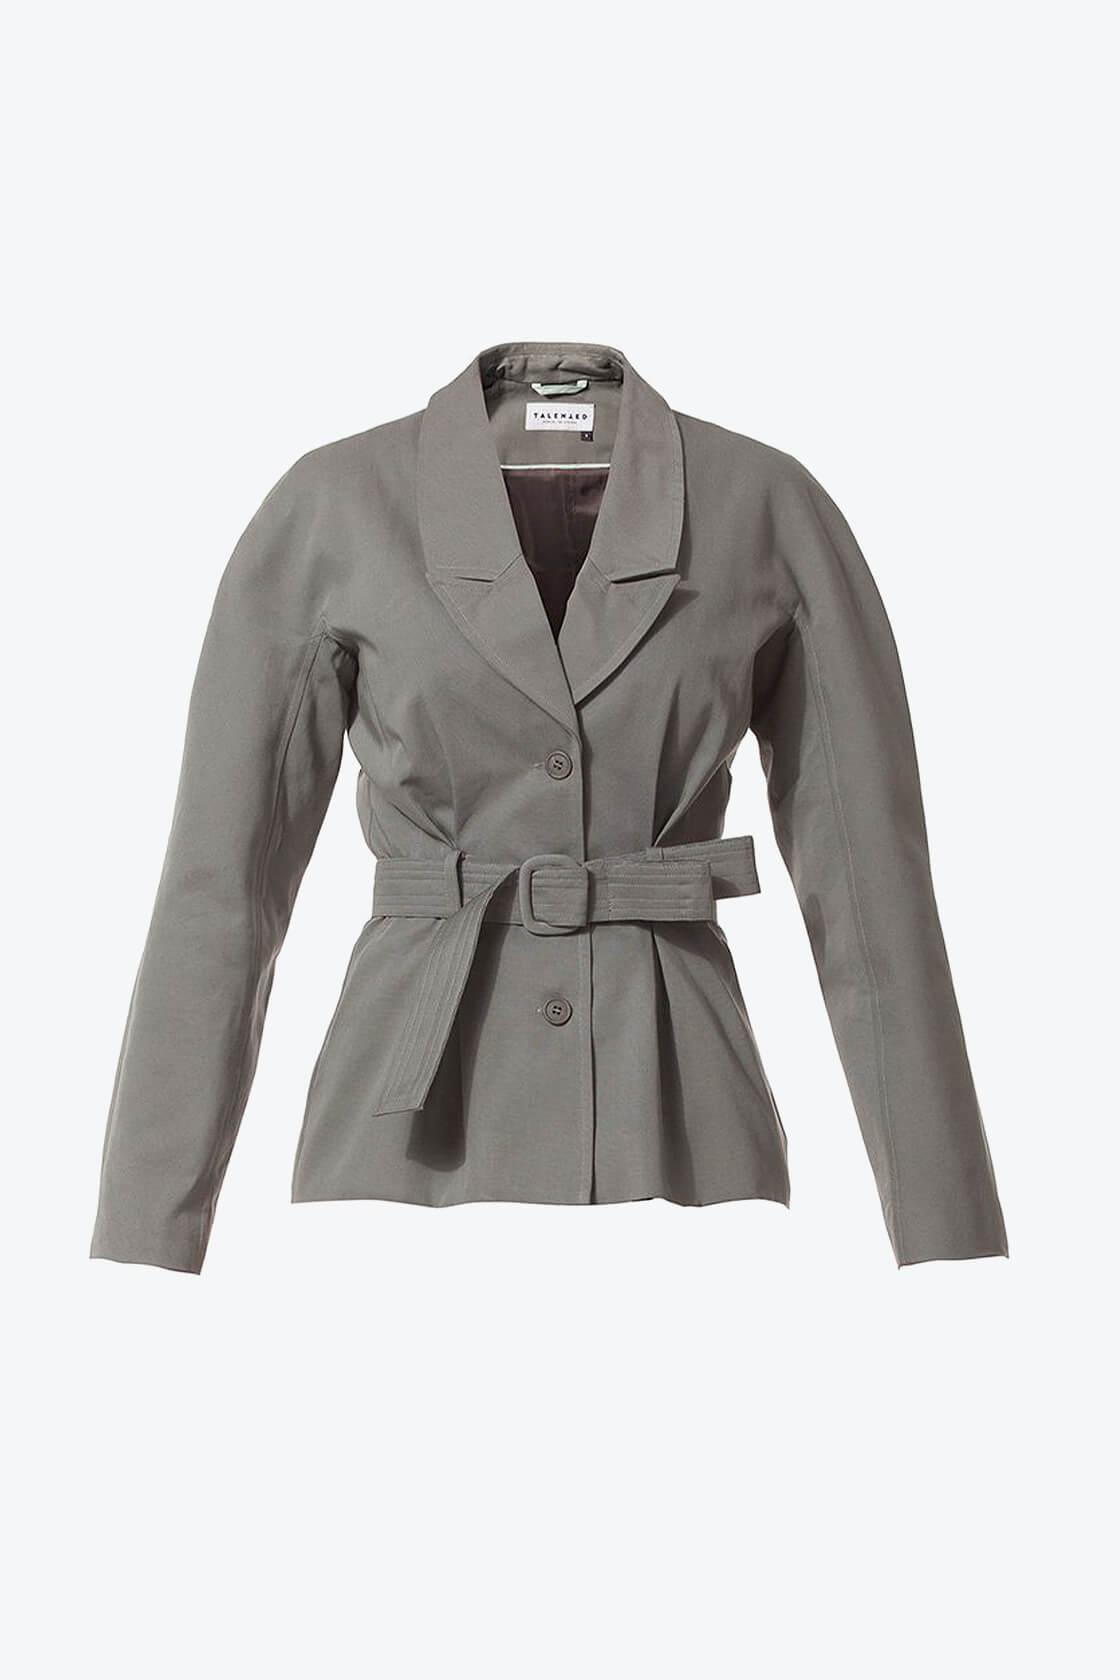 Ol10000229 Blazer With Belt And Side Pockets1